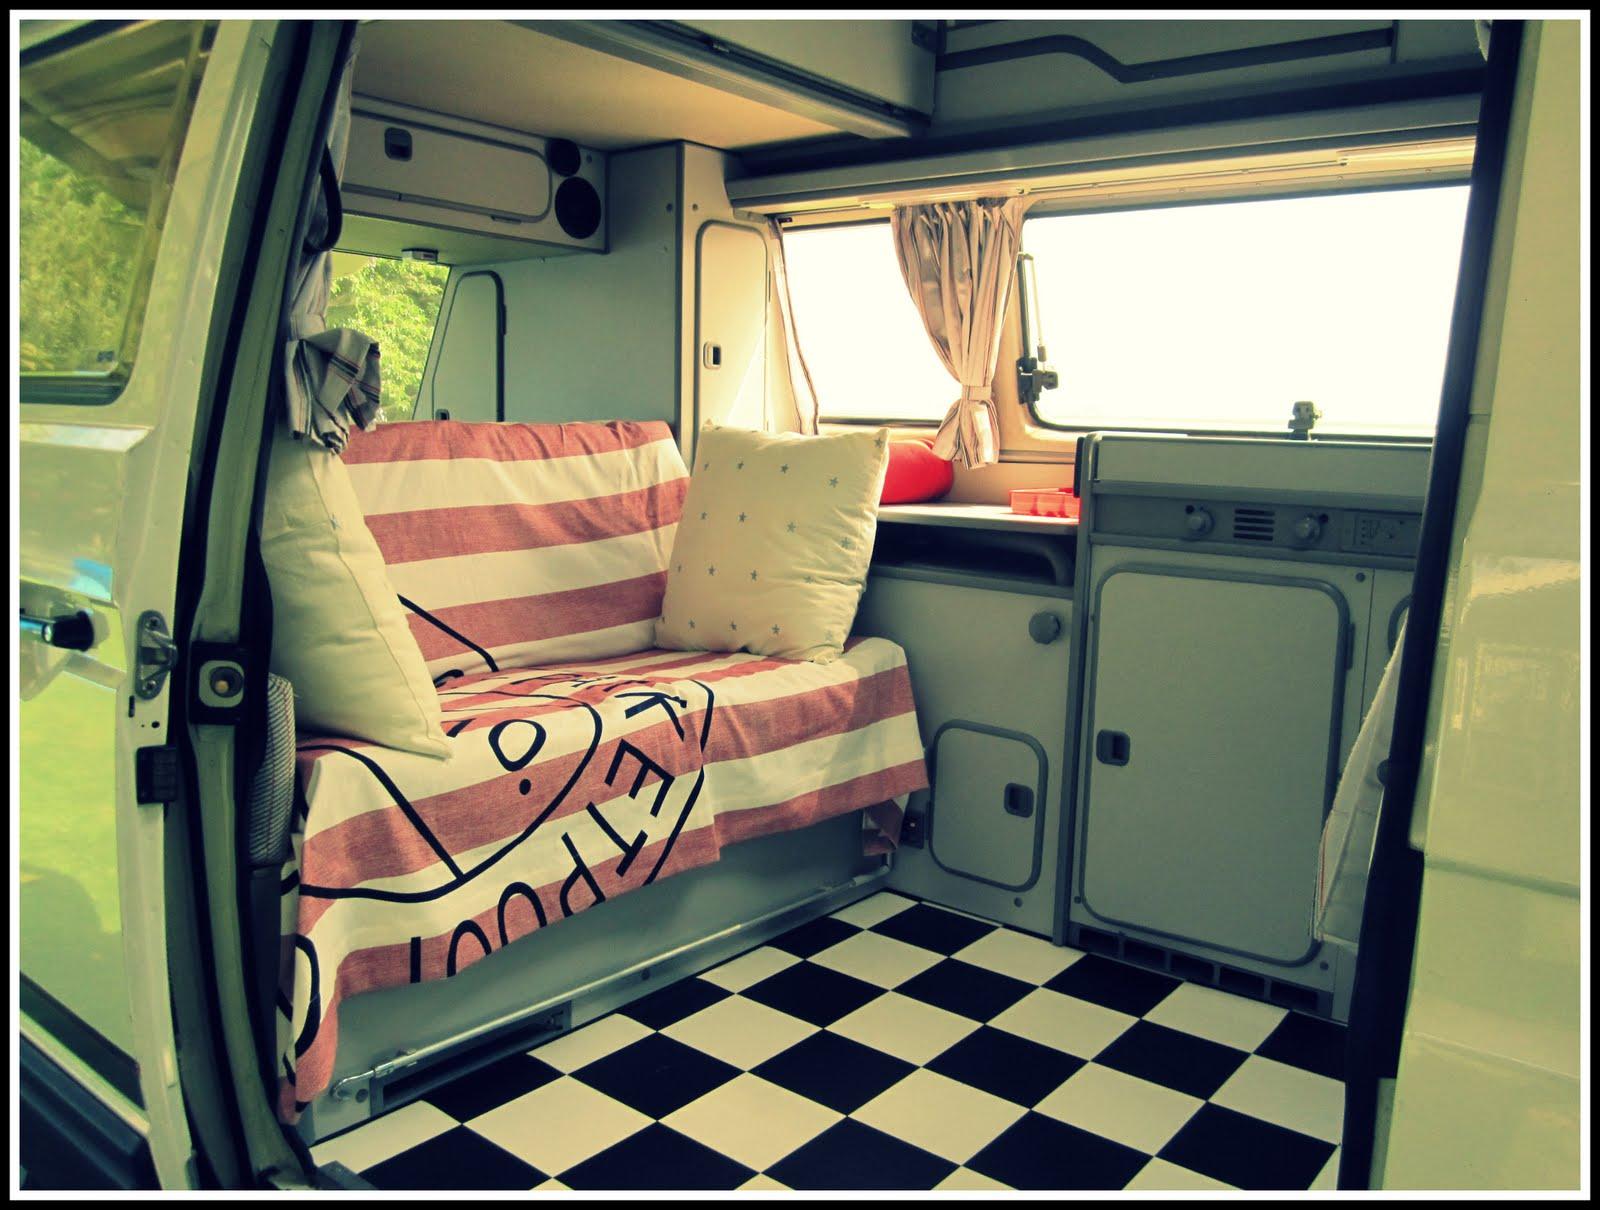 Ilovemyhouse august 2010 for Vw camper van interior designs